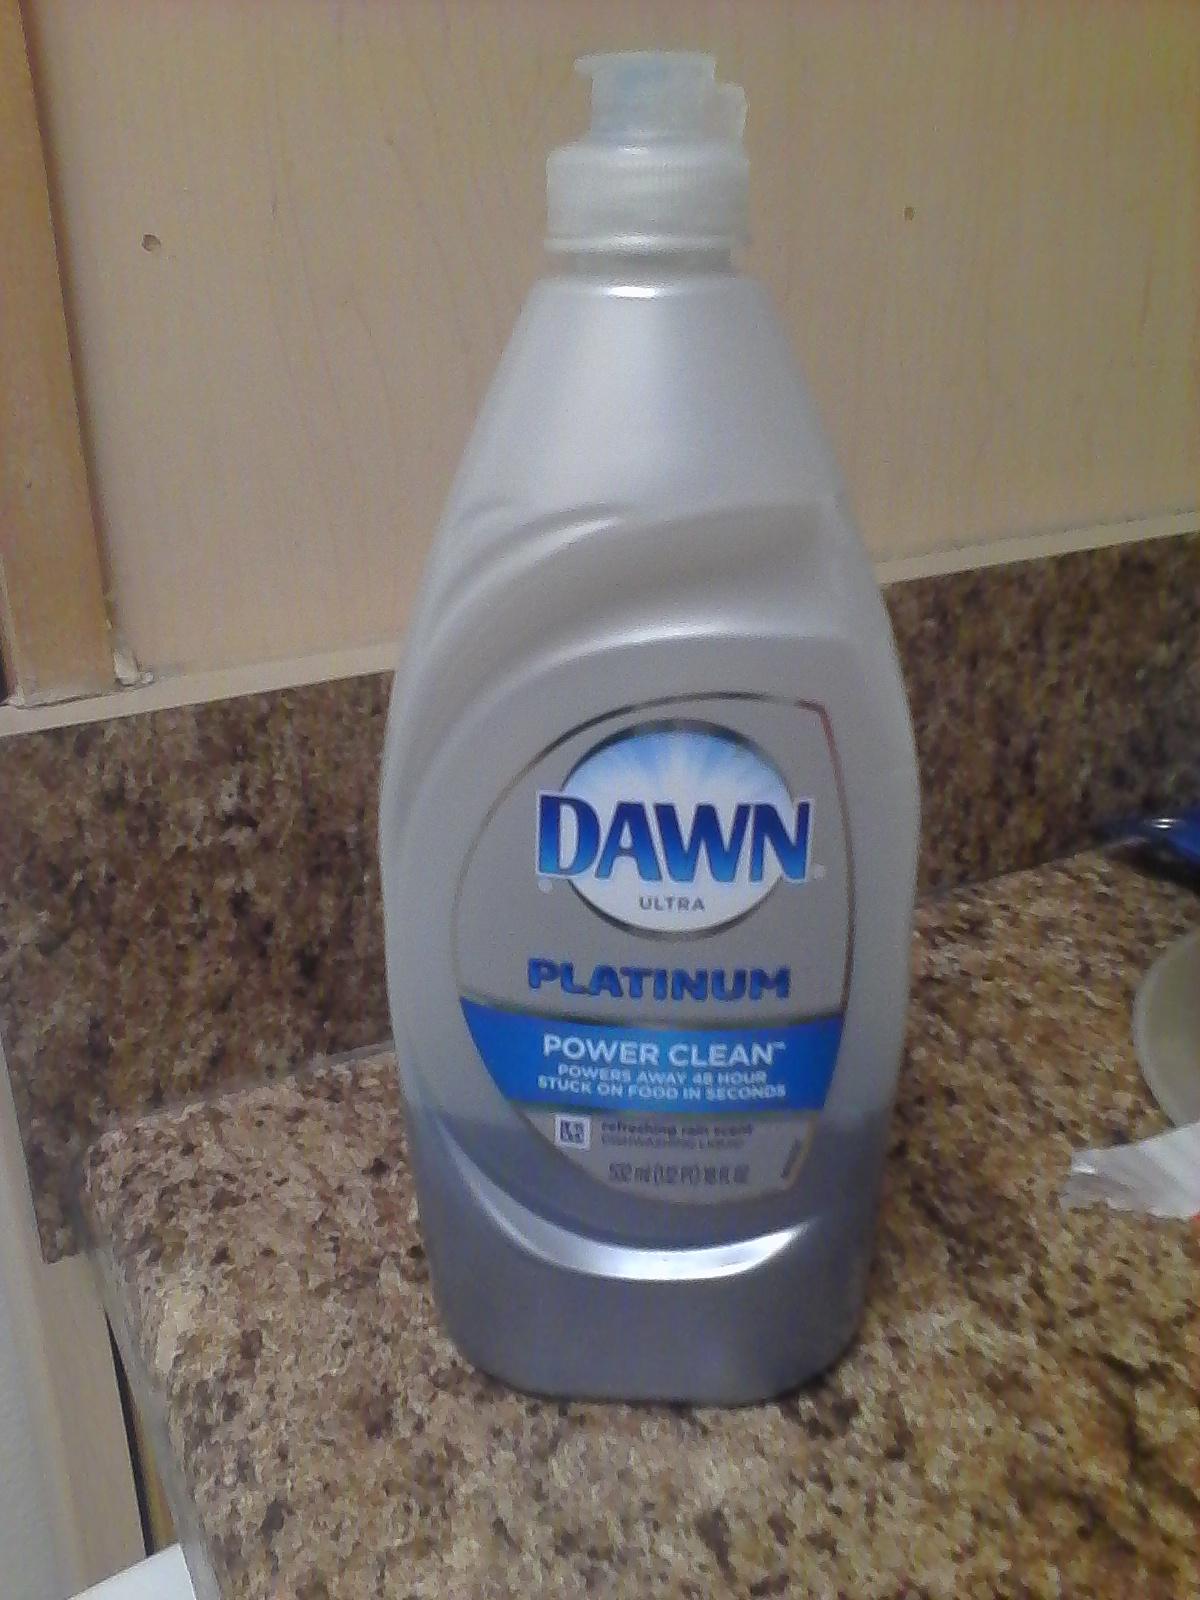 Dawn Platinum Bleach Alternative Dishwashing Liquid Morning Mist uploaded by Julia S.